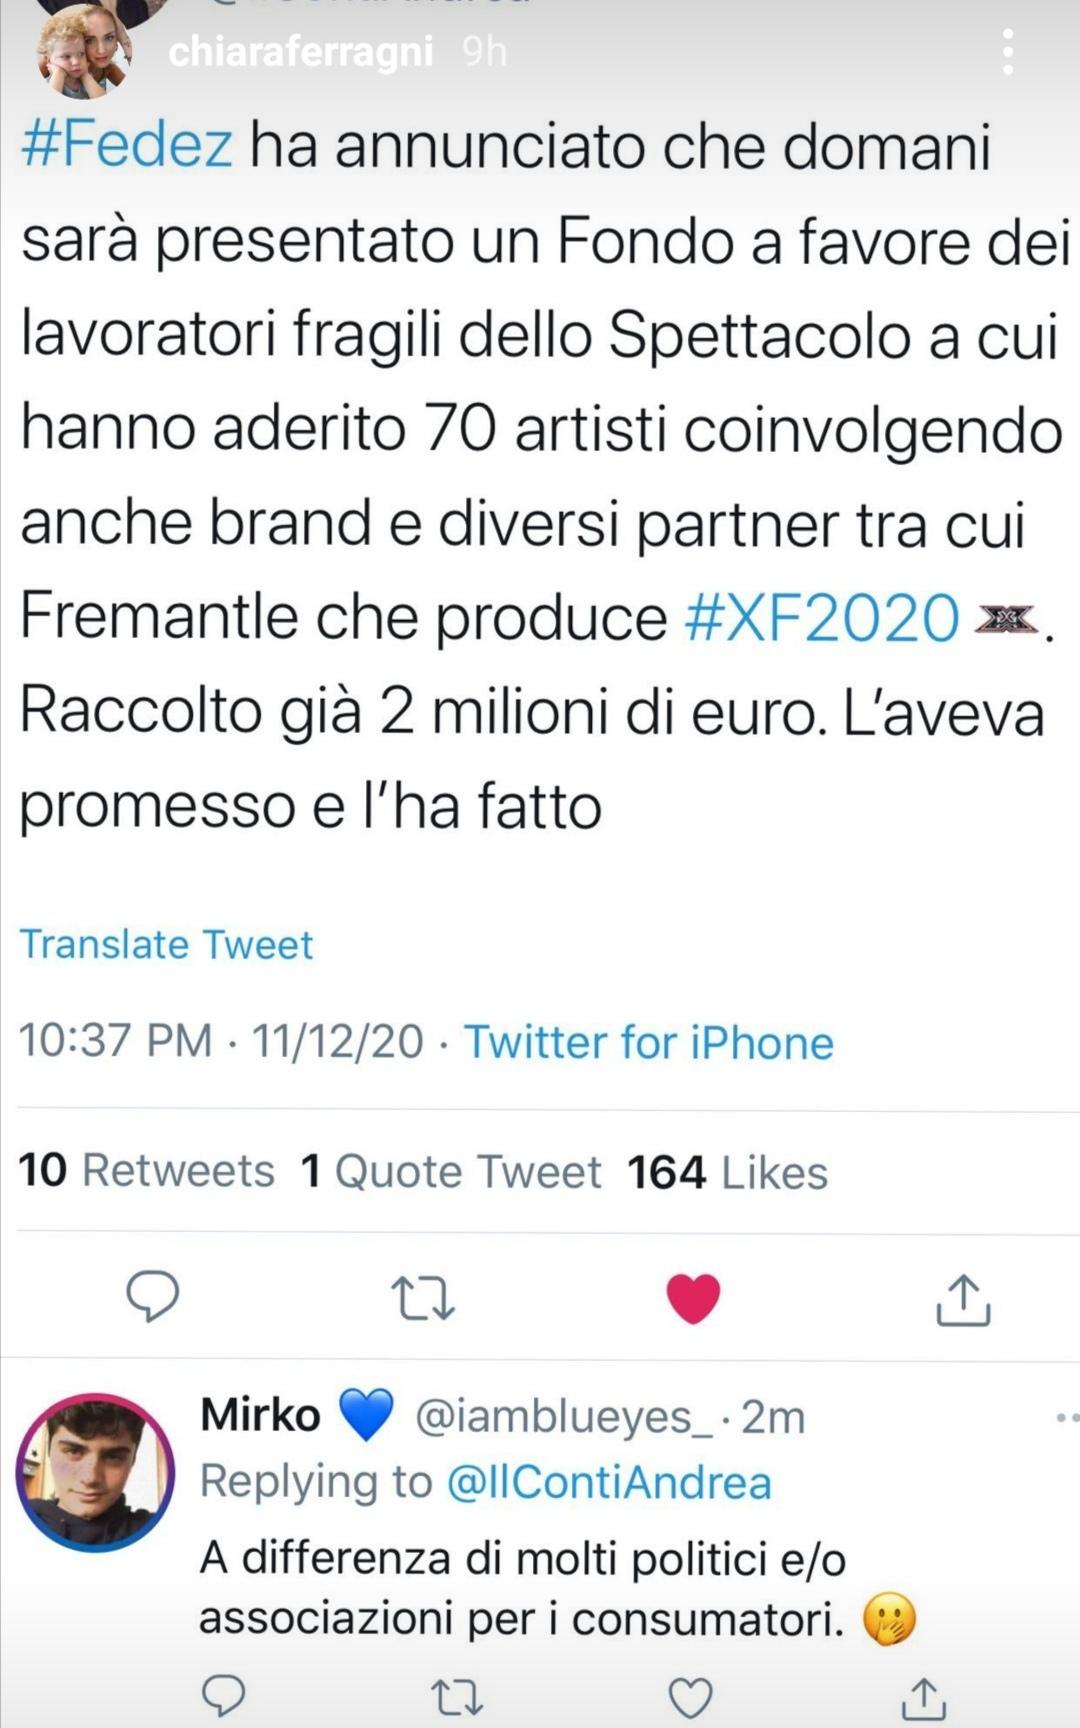 Fedez e il tweet di Chiara Ferragni